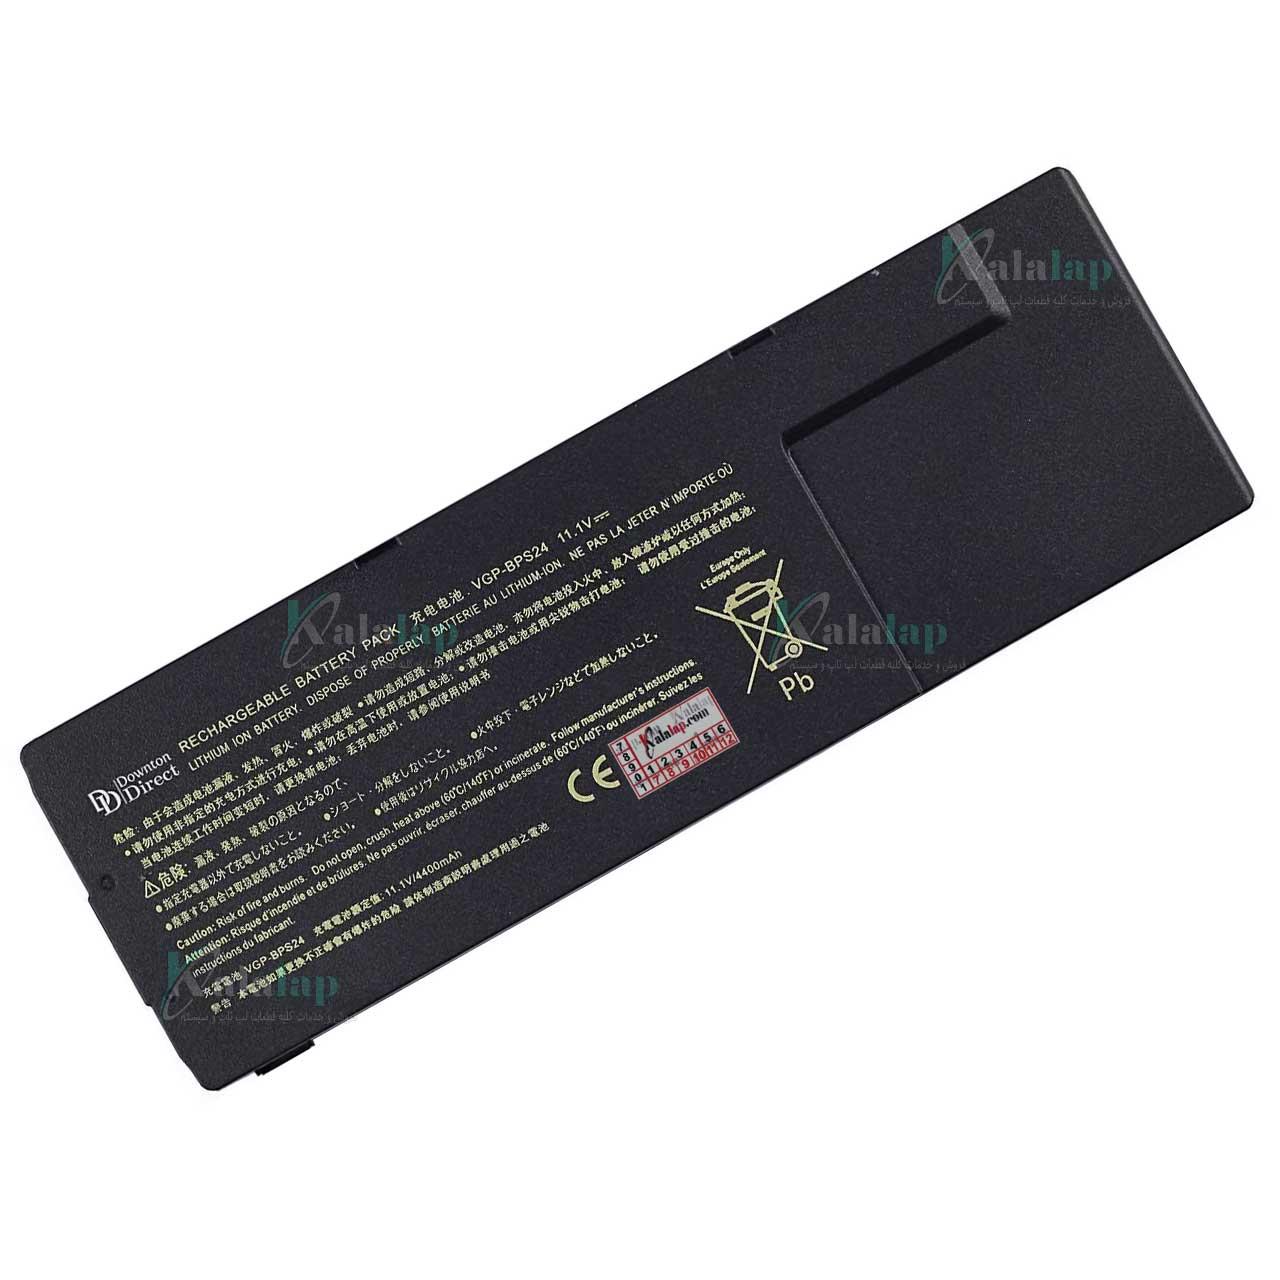 باتری لپ تاپ سونی Battery Laptop Sony VGP-BPS24